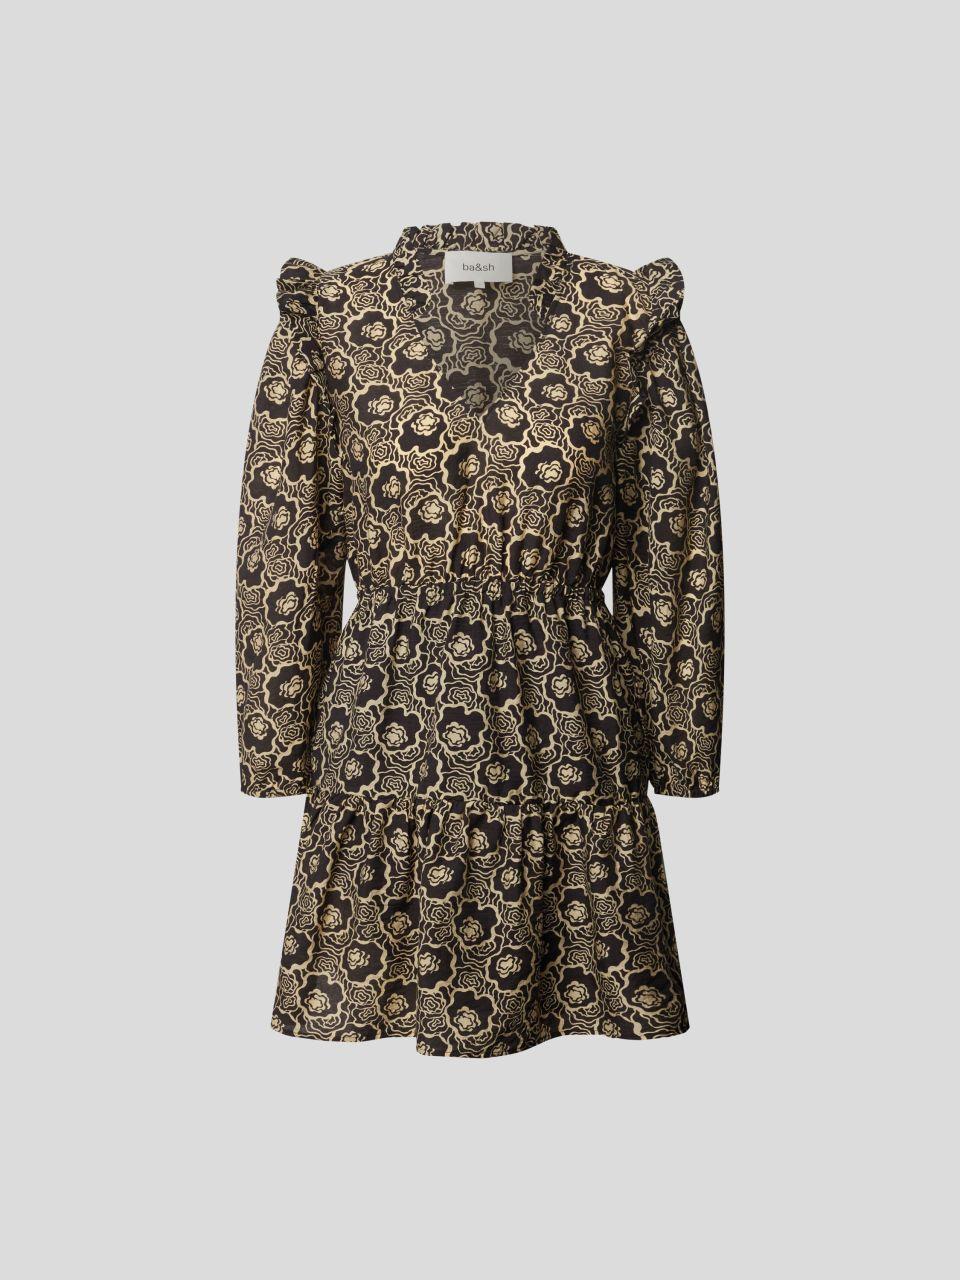 Minikleid mit Allover-Muster